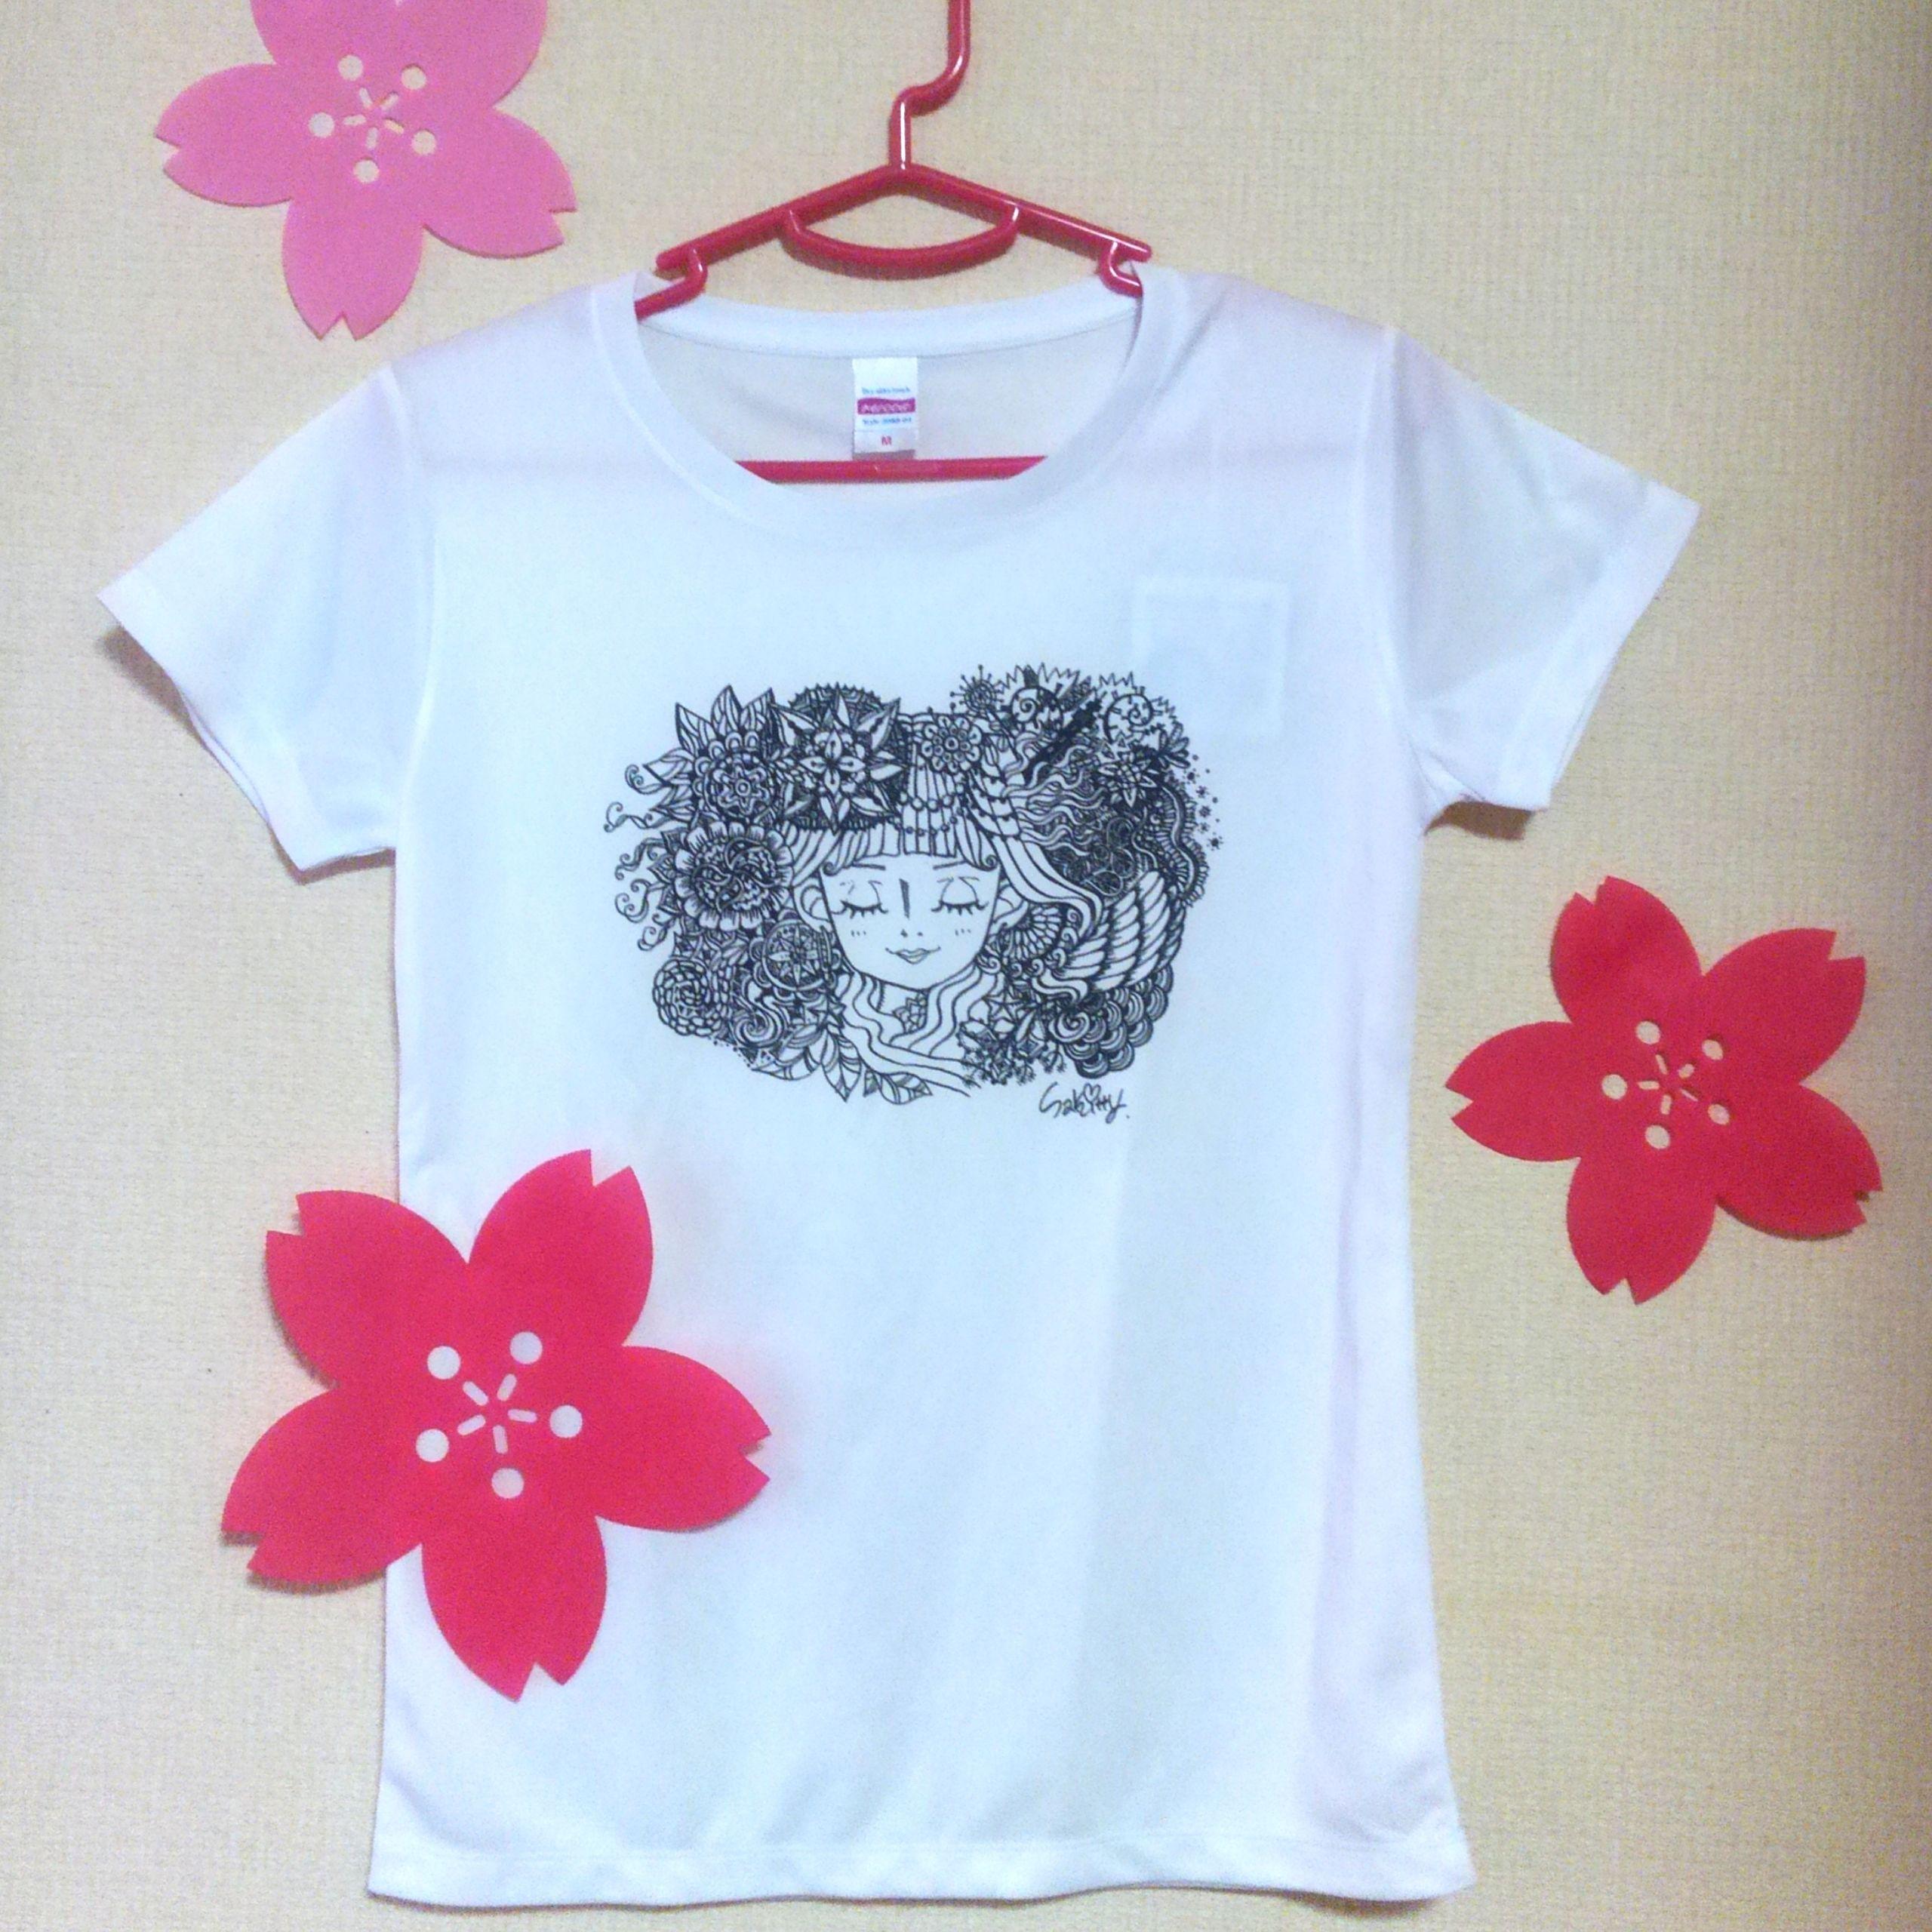 SAKITTY ART?オリジナルTシャツ(M)¥3200→値下げ(※名刺付き)